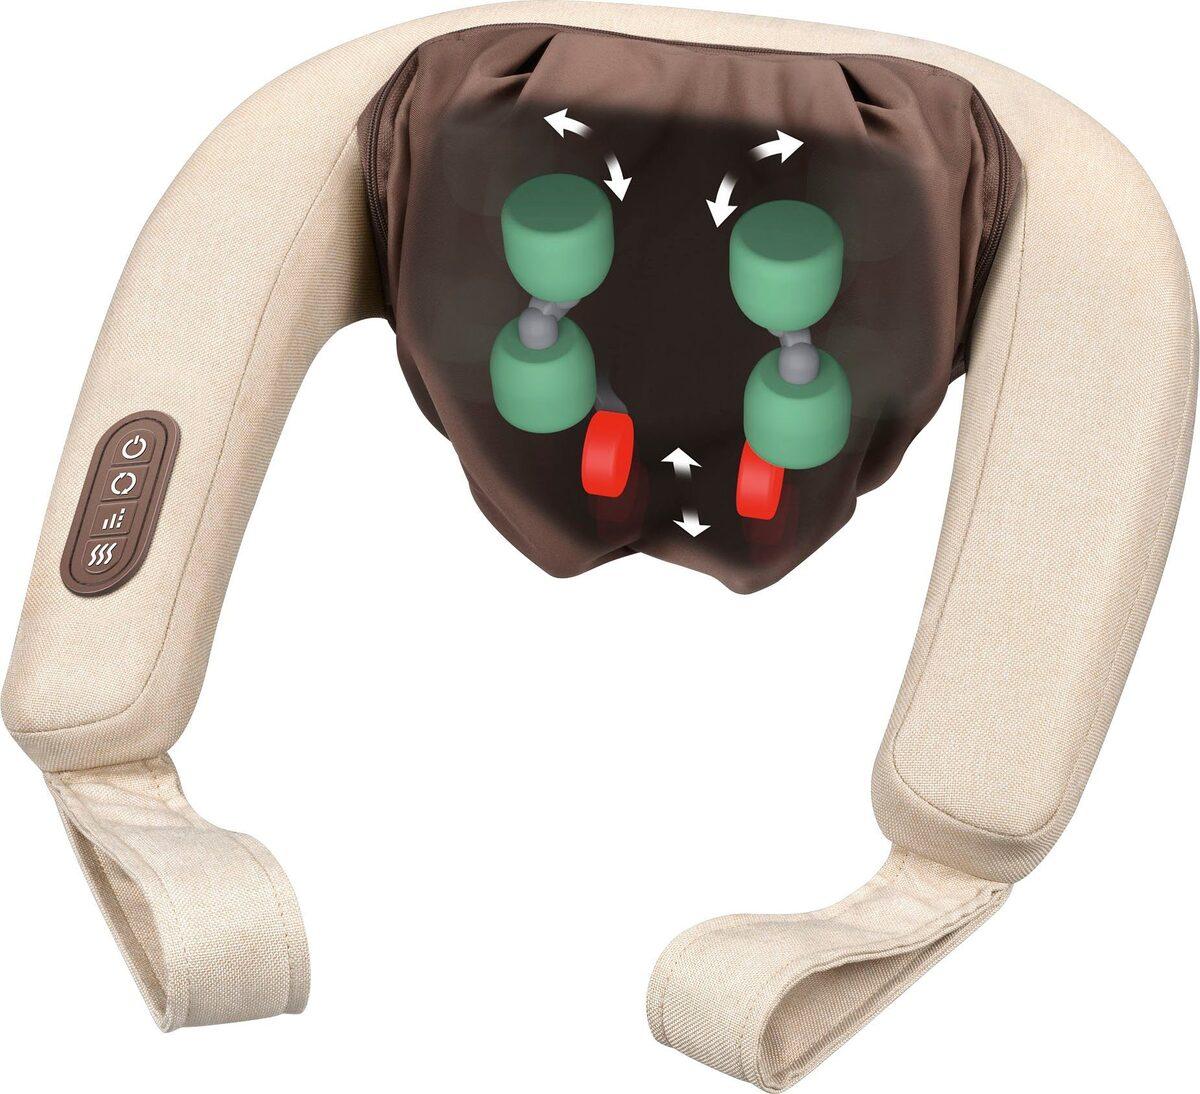 Bild 1 von BEURER Nacken-Massagegerät »MG 153 4D«, 1-tlg.